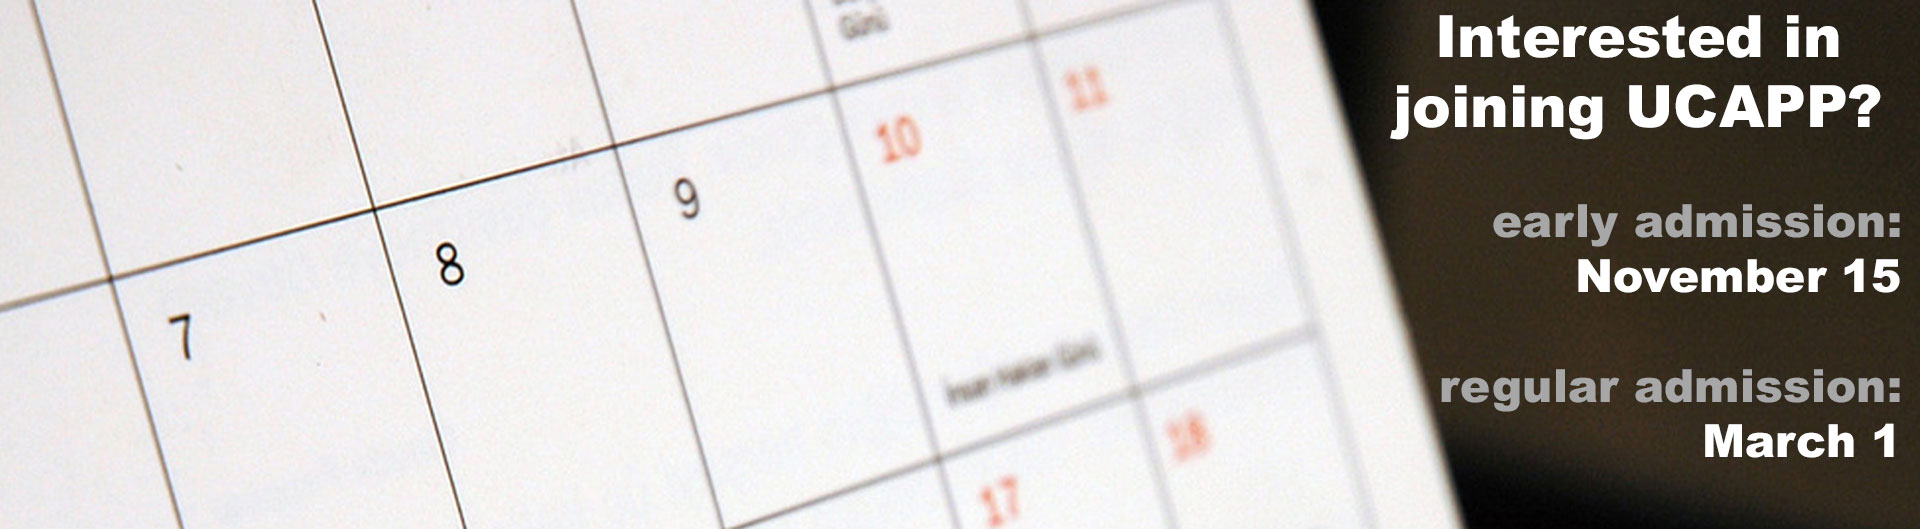 Calendar displaying UCAPP's admission deadlines